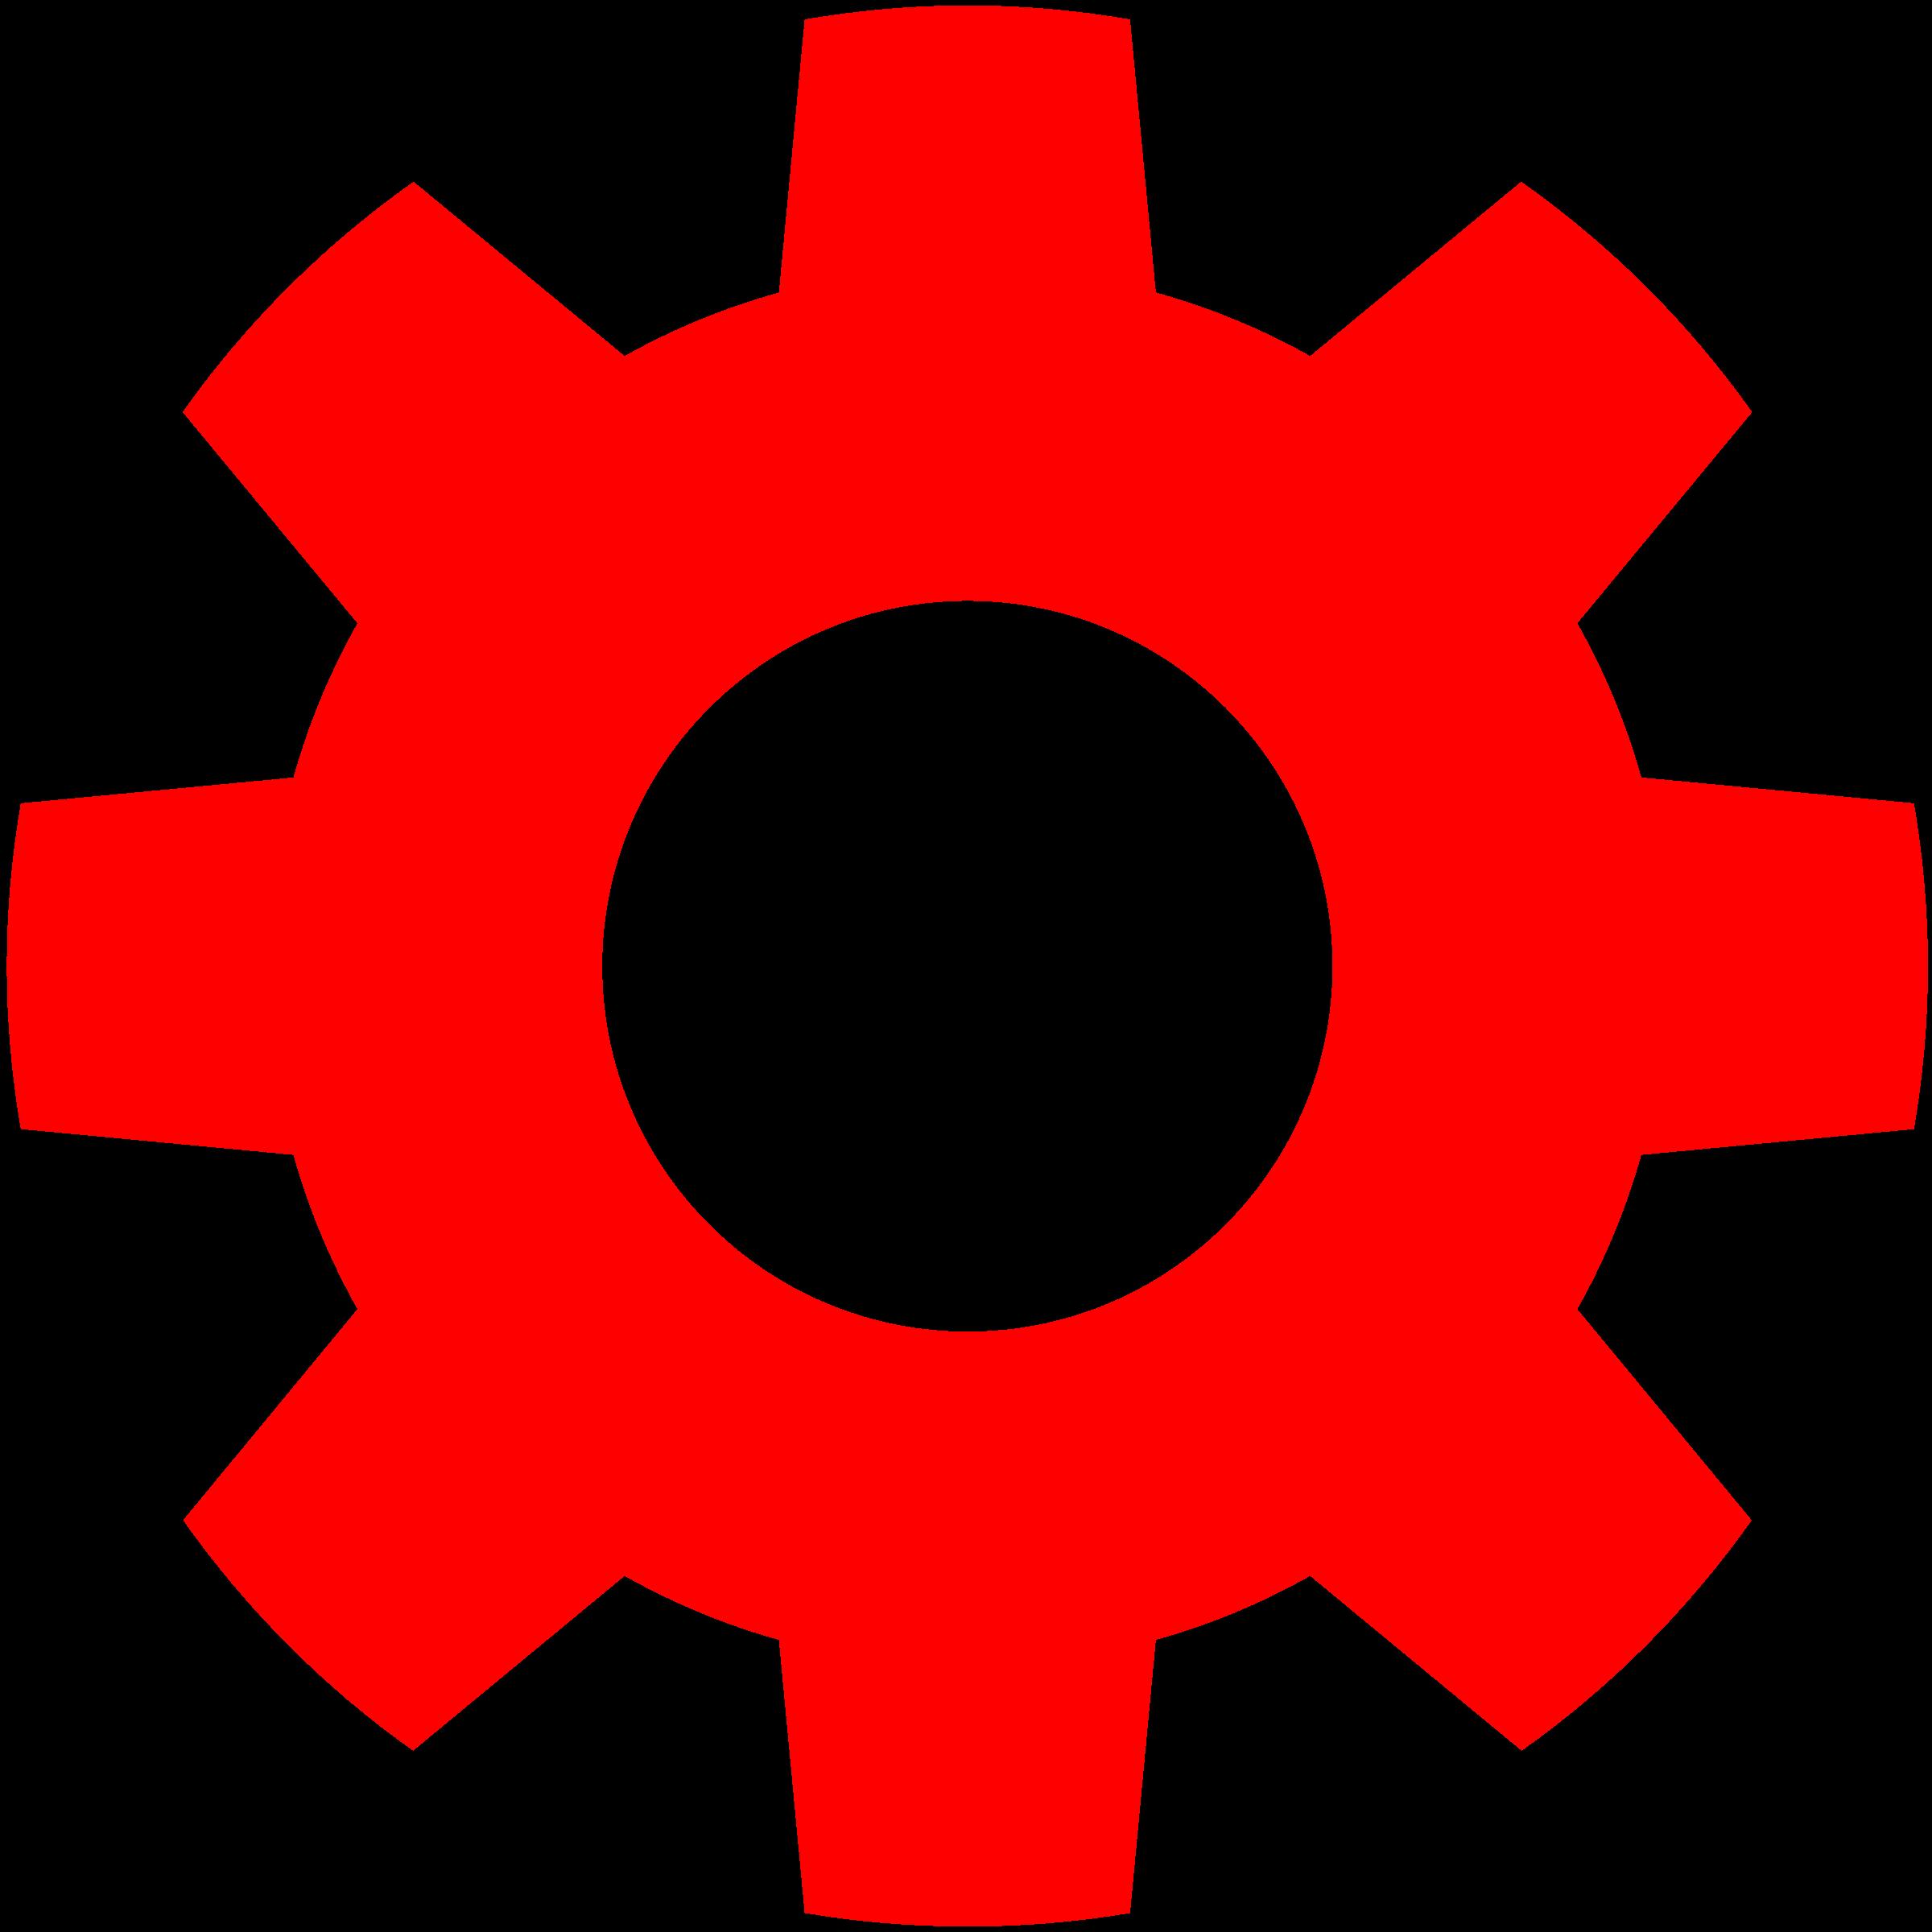 Gear Clipart Clip art of Gear Clipart #6440 — Clipartwork.